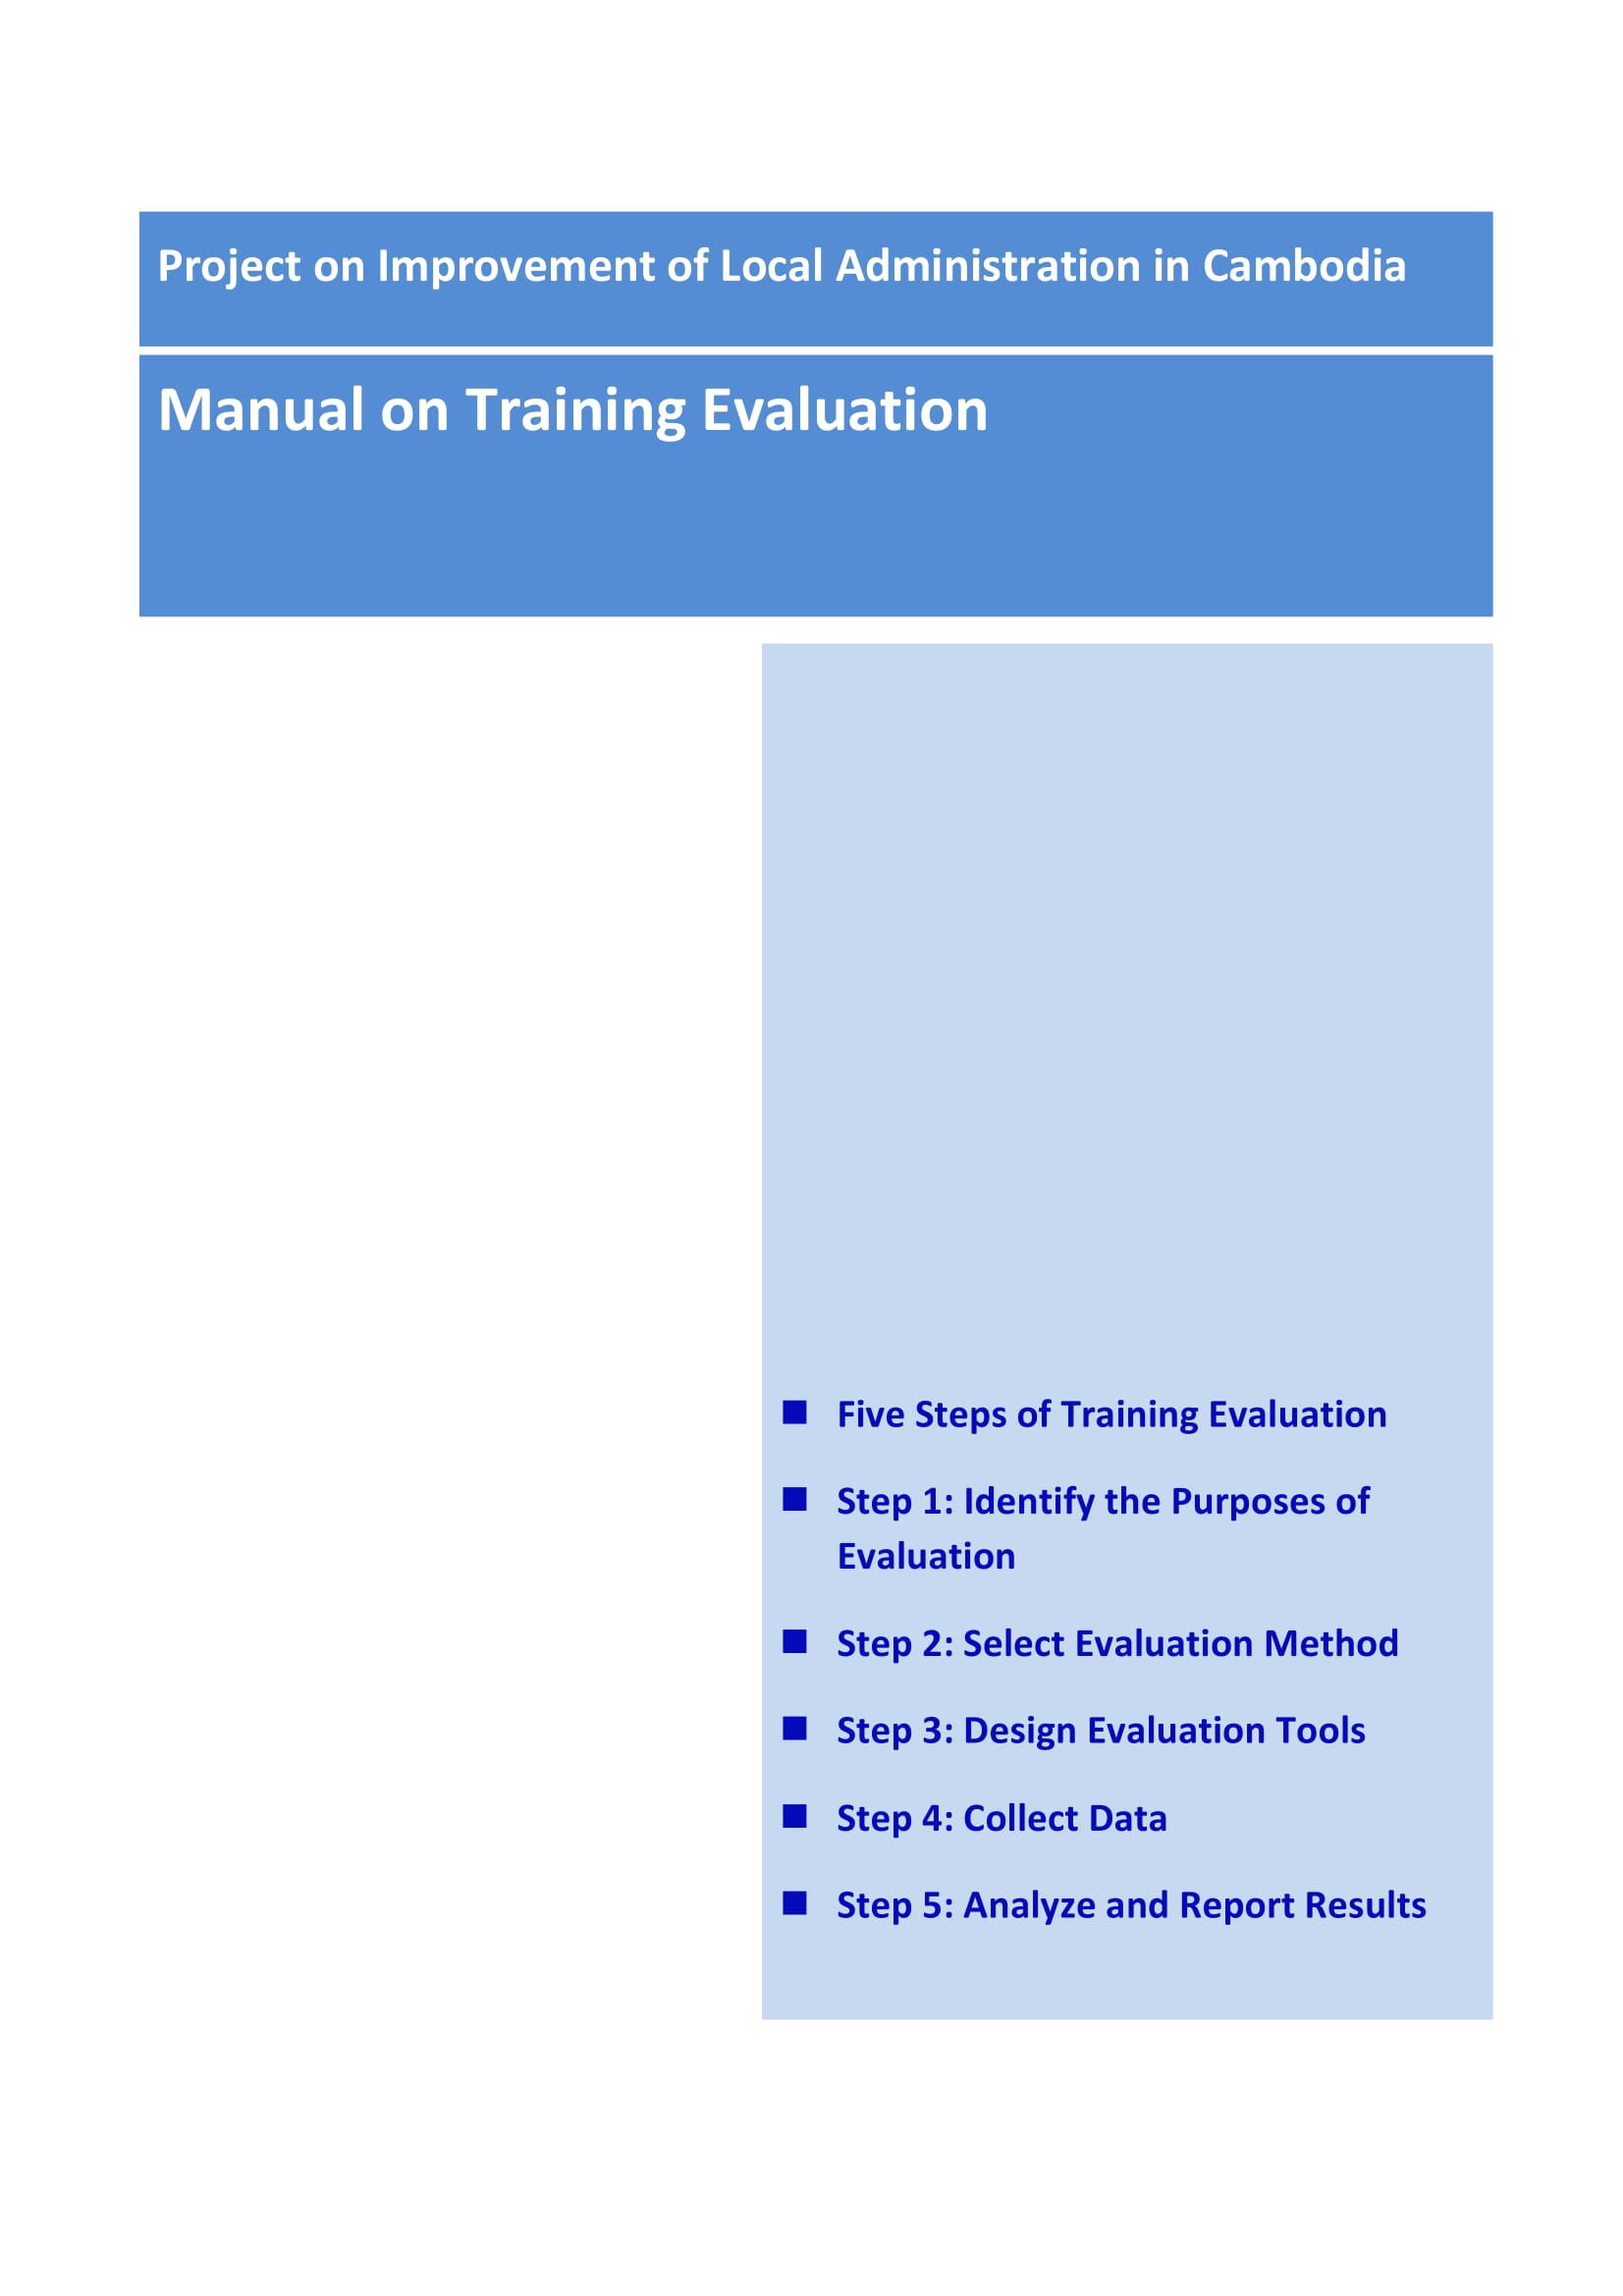 trainingevaluation manual 01